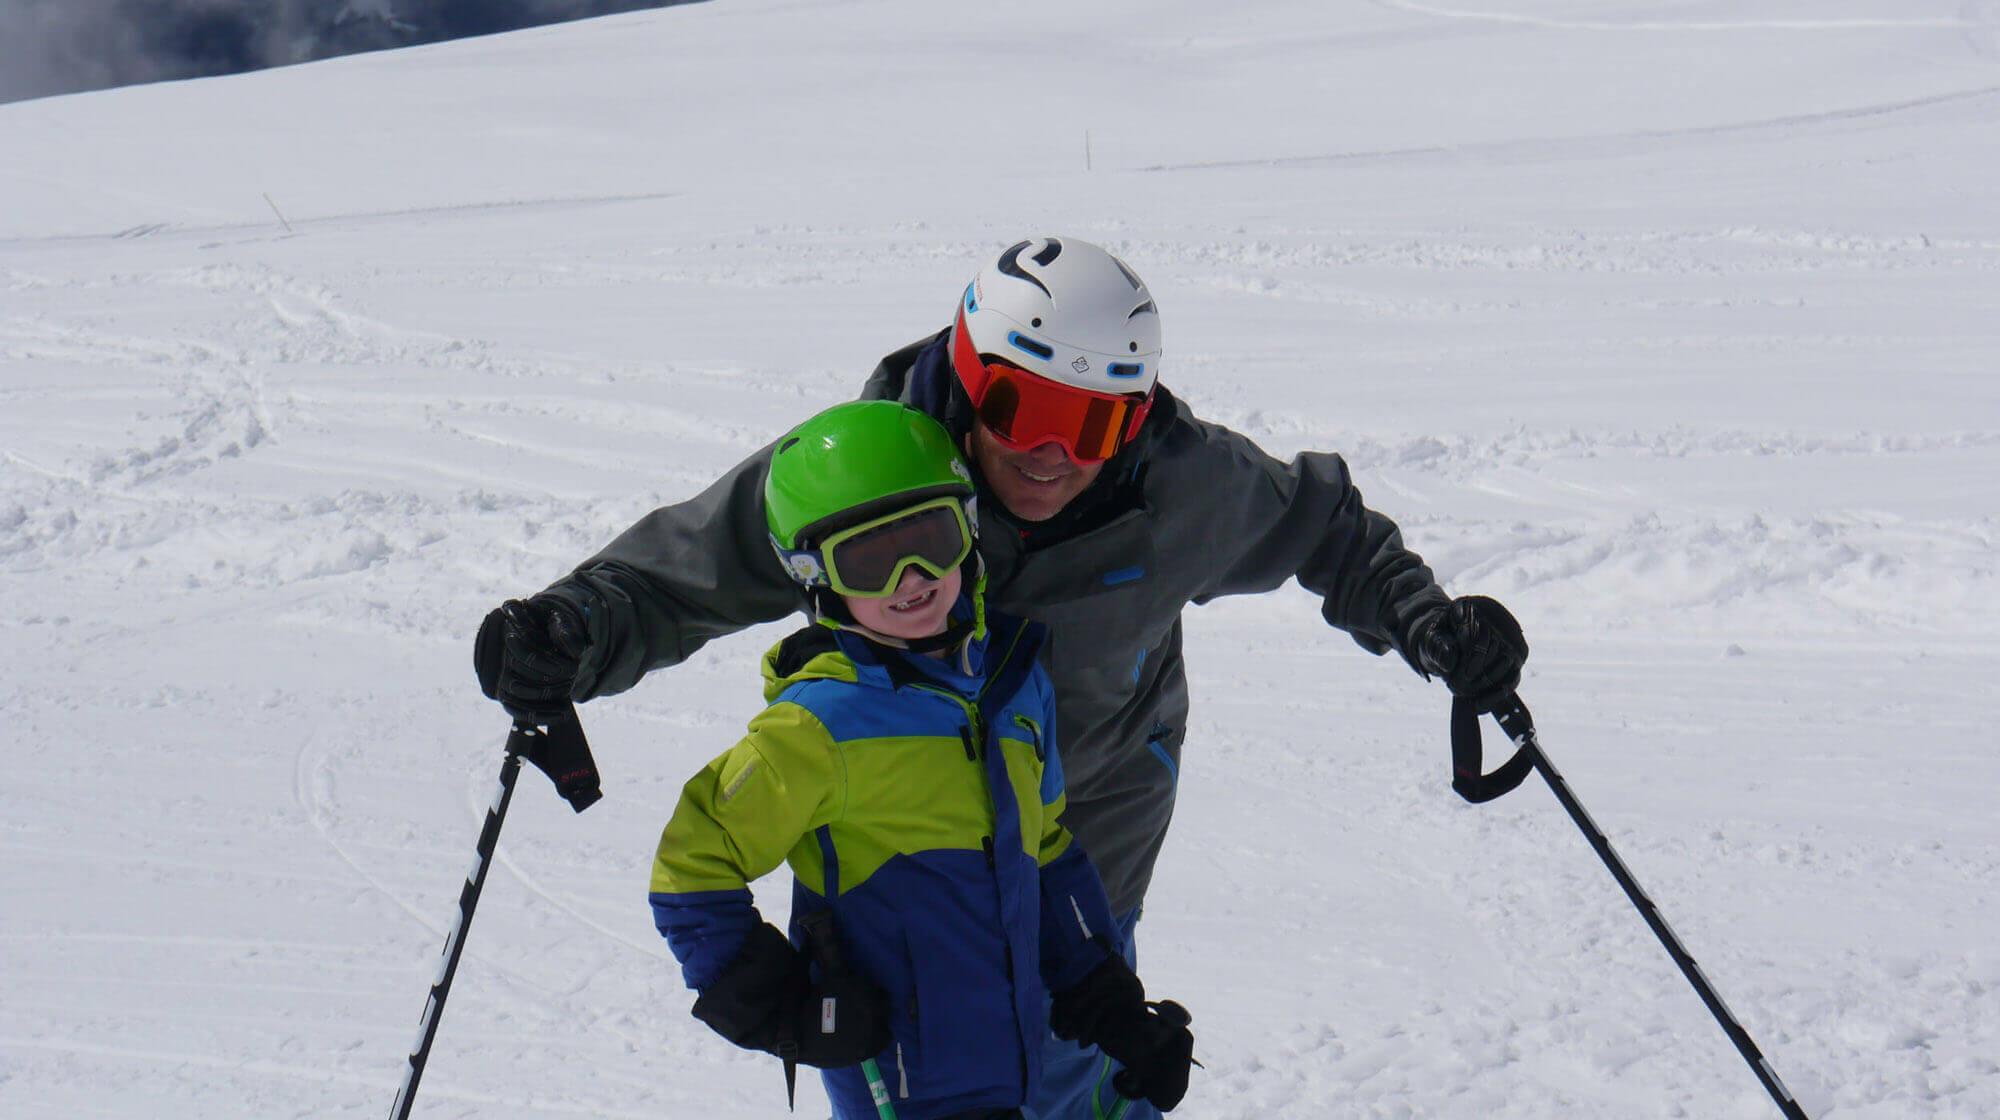 Roddy Willis Beginner Ski Lessons